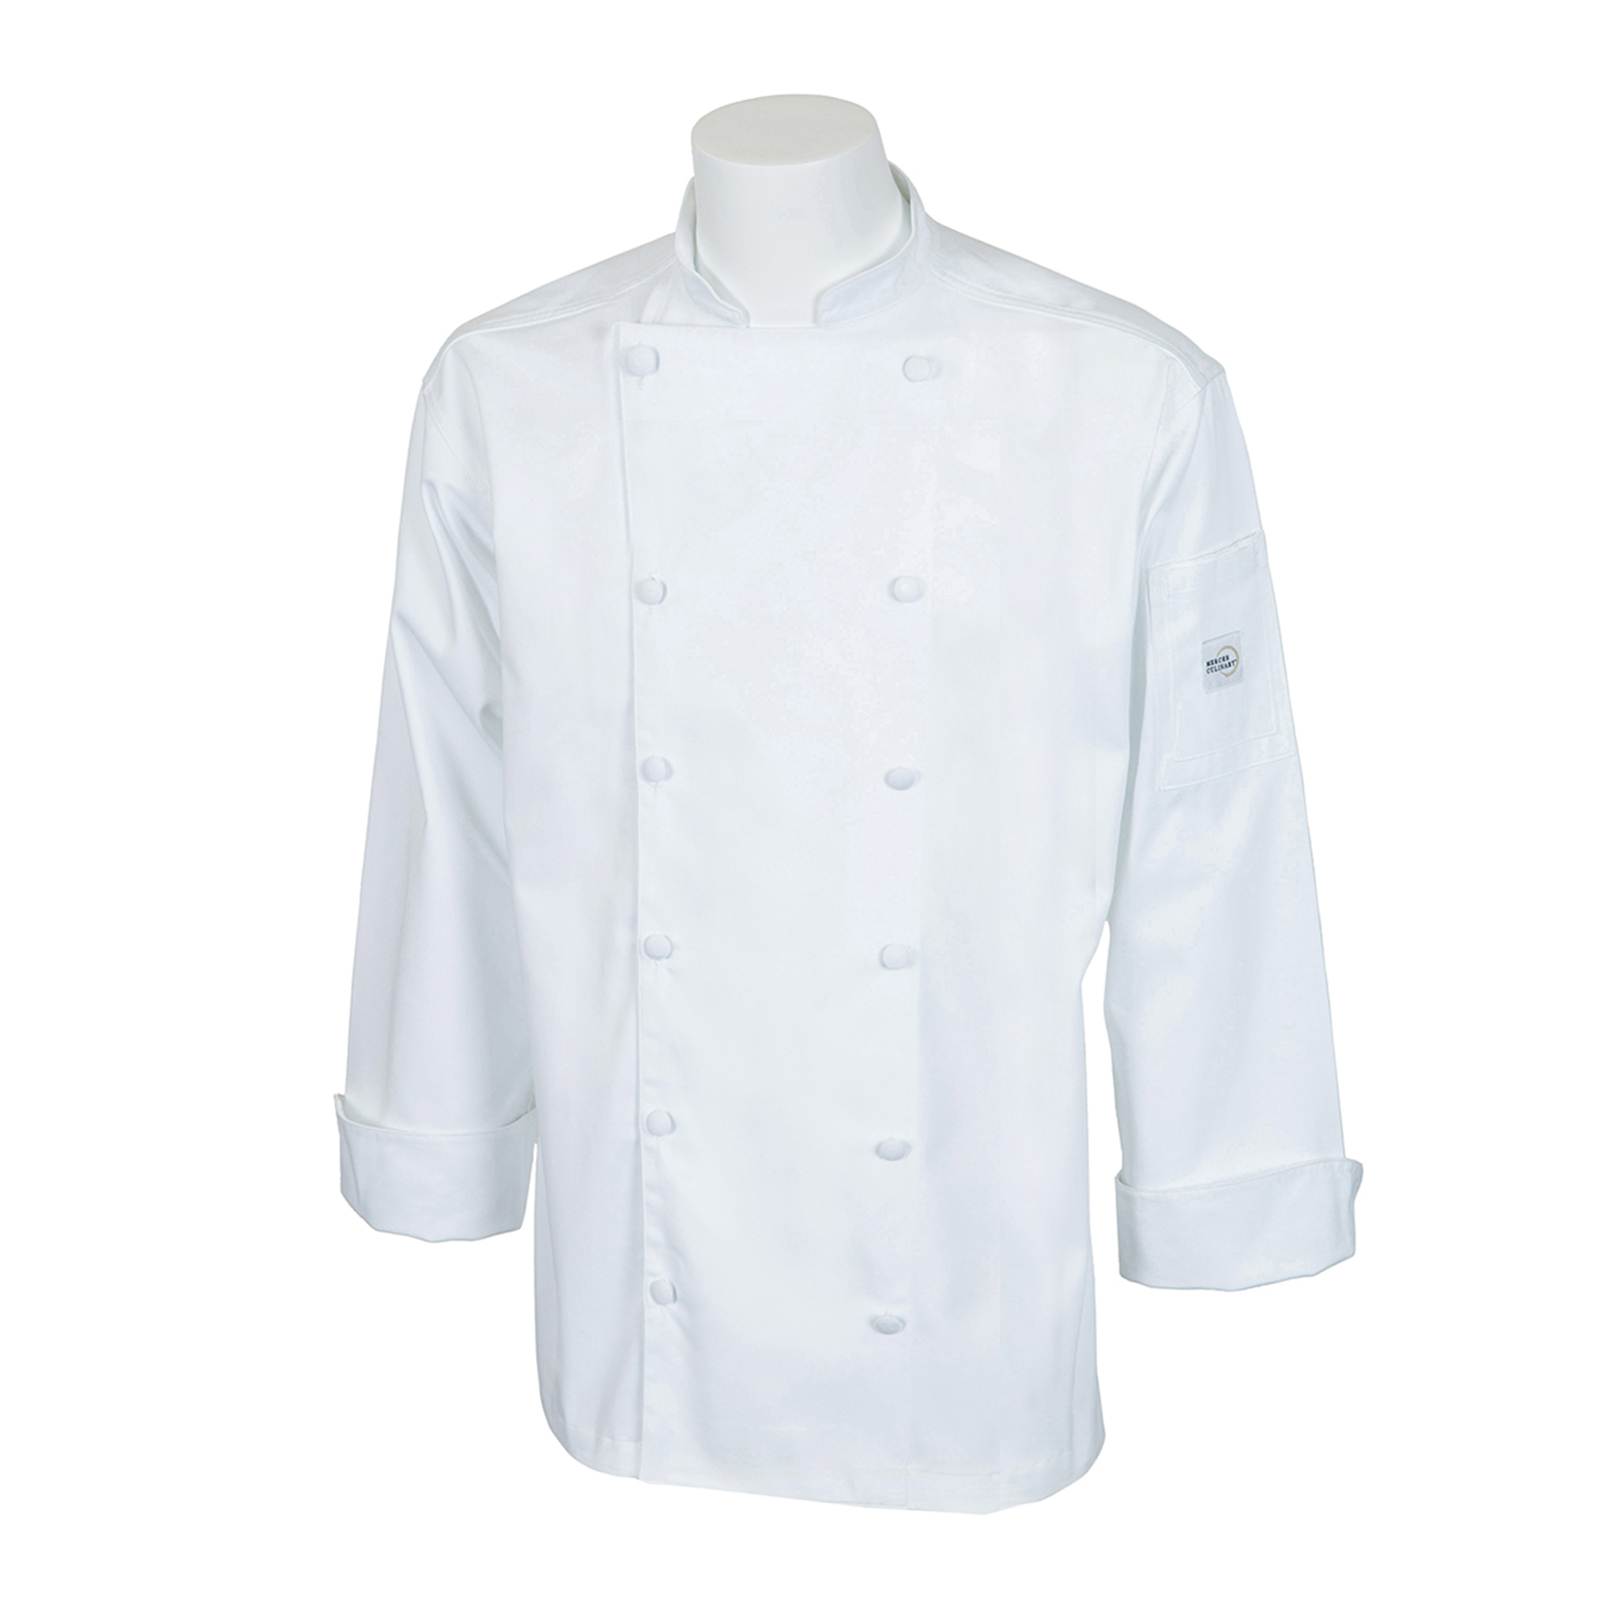 Mercer Culinary M62030WH2X chef's coat